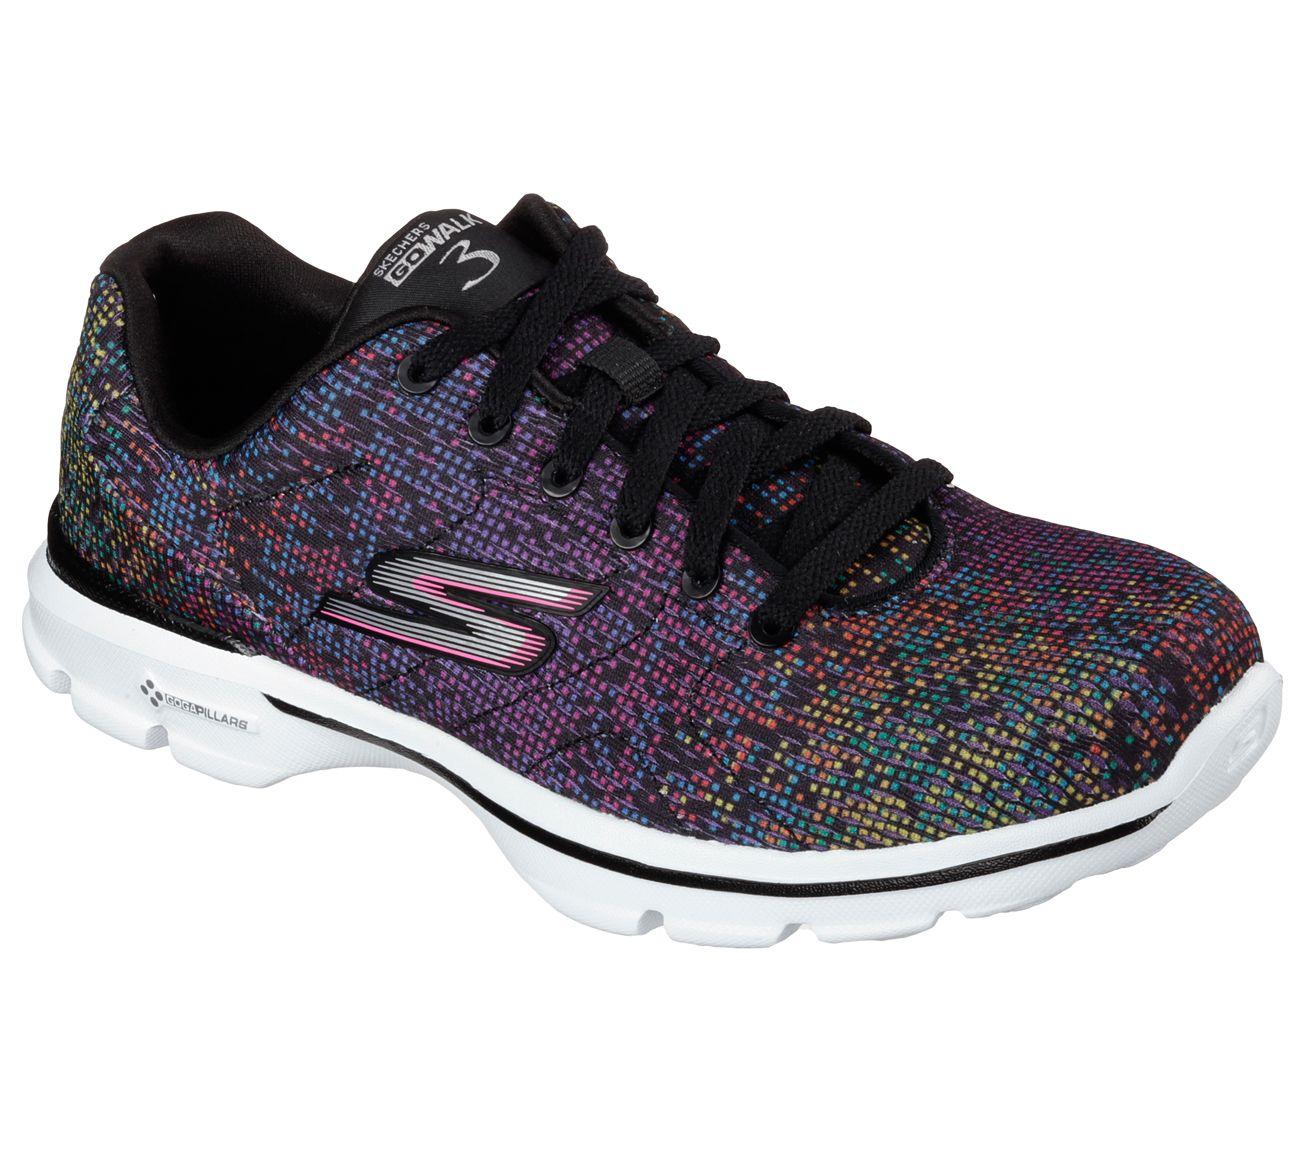 Skechers Womens Go Walk 3 Shoes  Black Multi Print